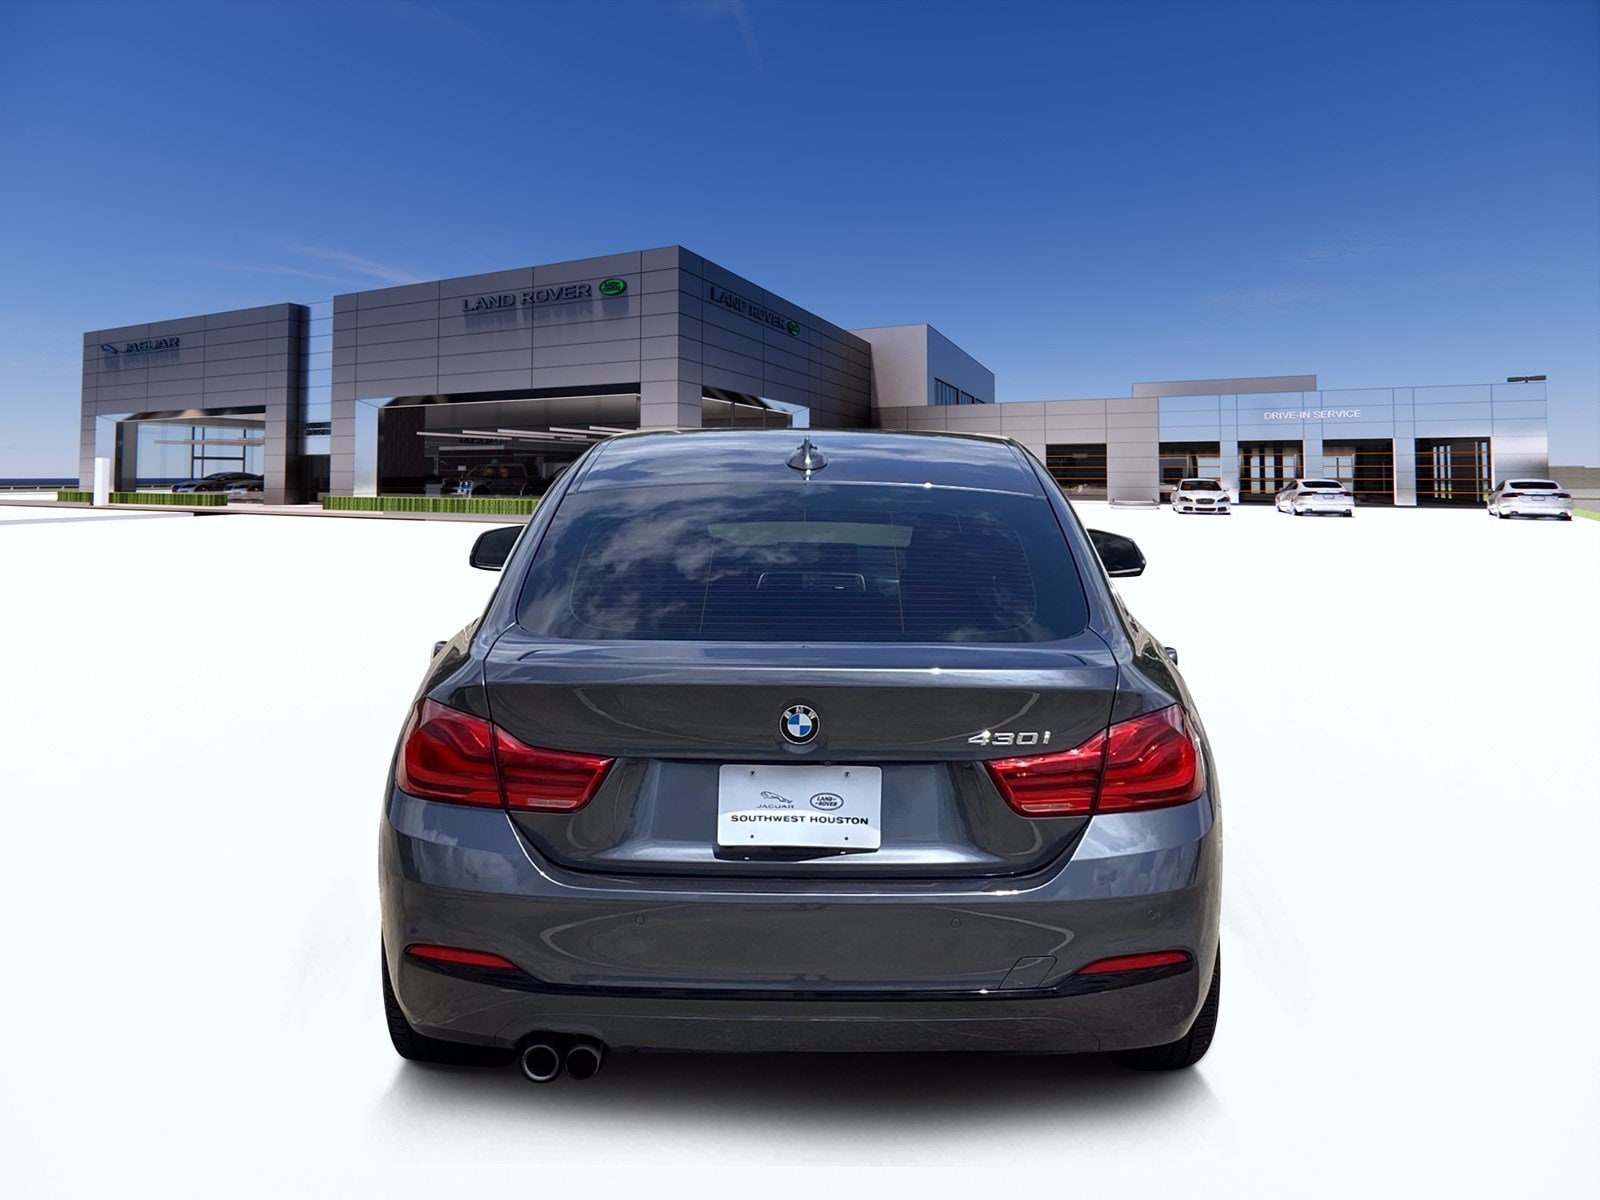 car-gallery-7